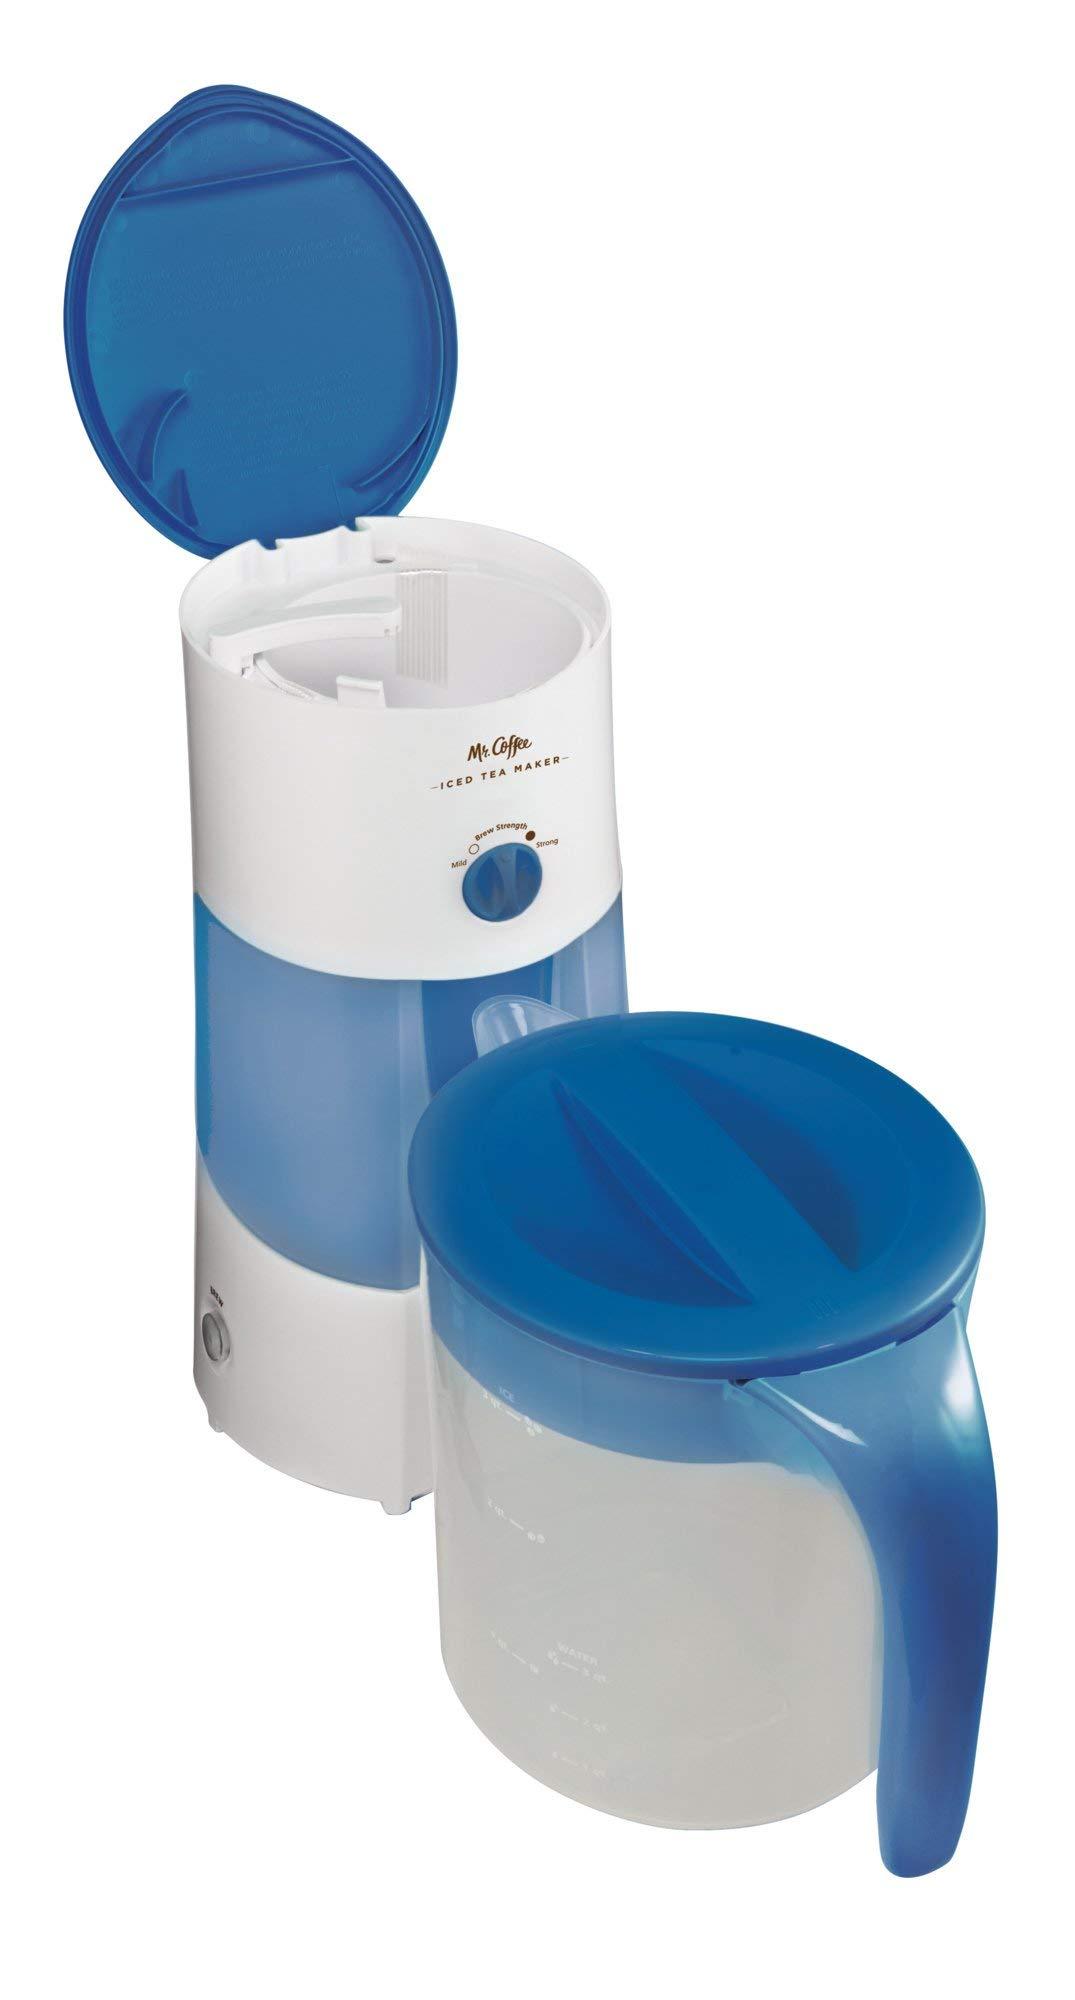 Mr. Coffee 3-Quart Iced Tea and Iced Coffee Maker, Blue (Renewed) by Mr. Coffee